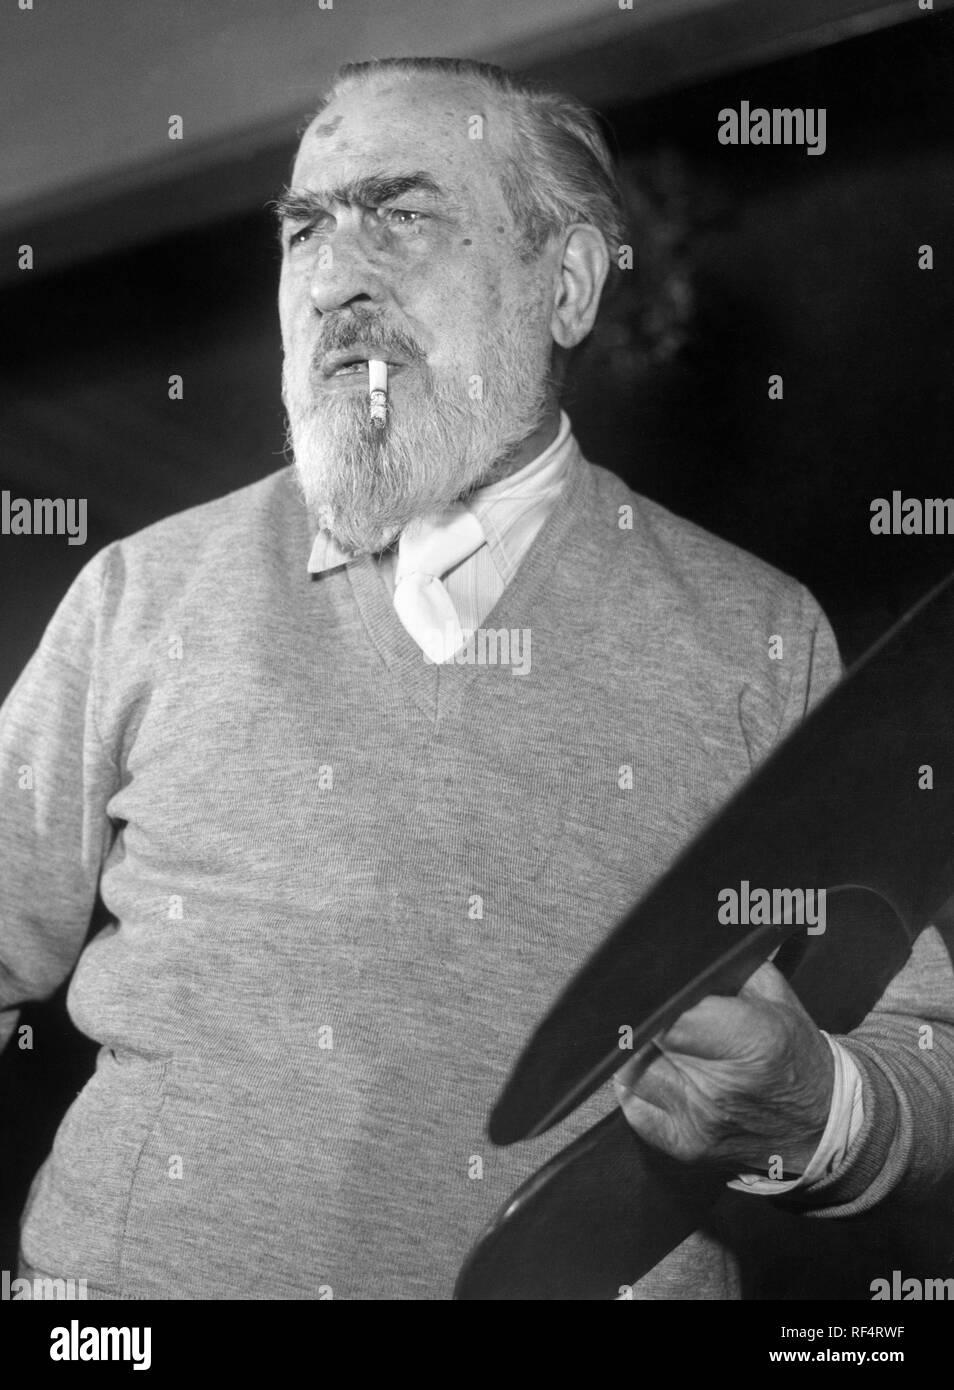 ettore cosomati, 1960 Stock Photo